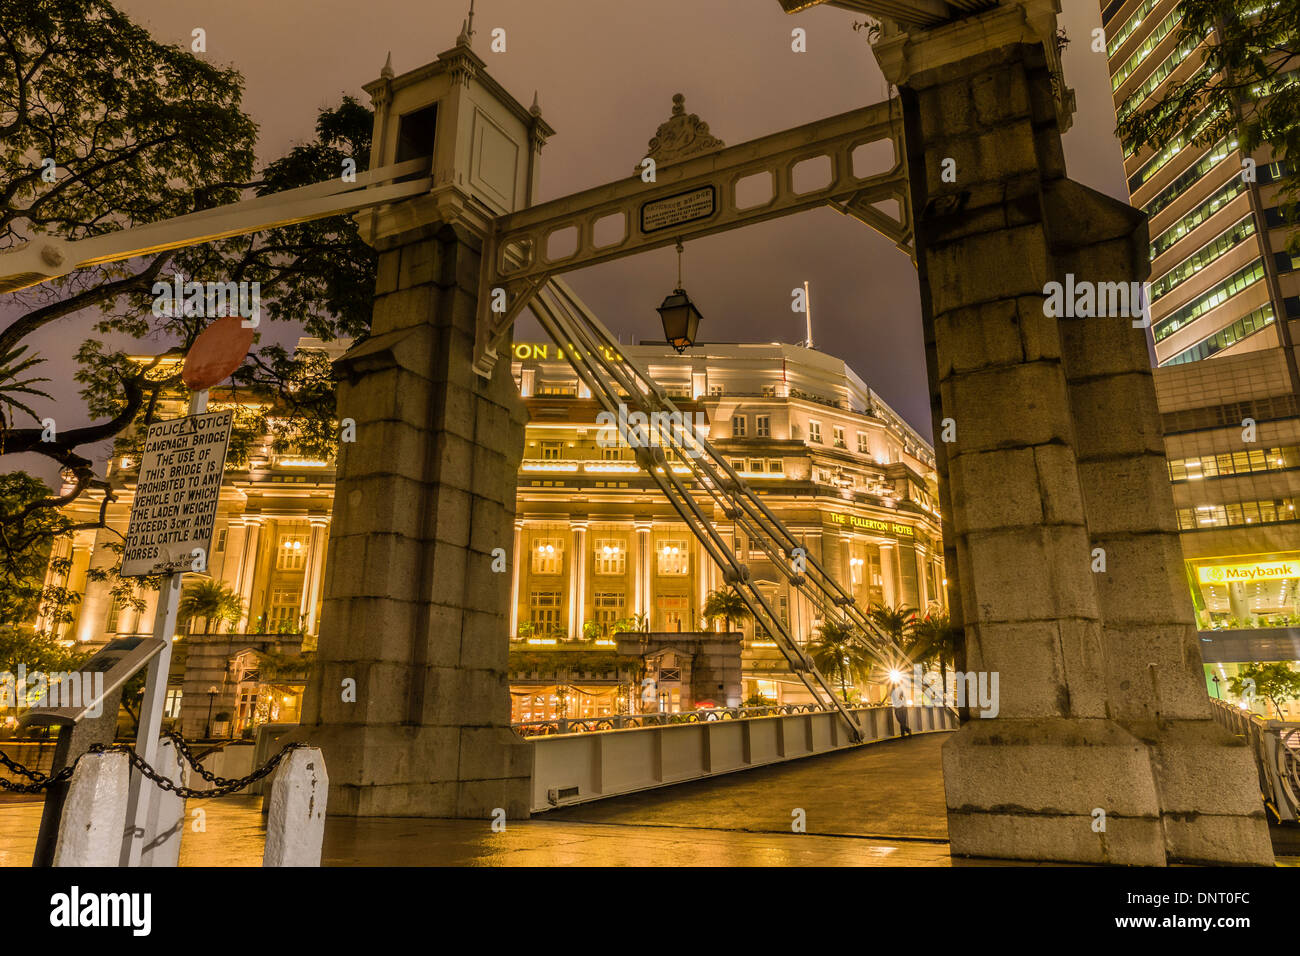 Night View of Cavenagh Bridge and The Fullerton Hotel, Singapore - Stock Image